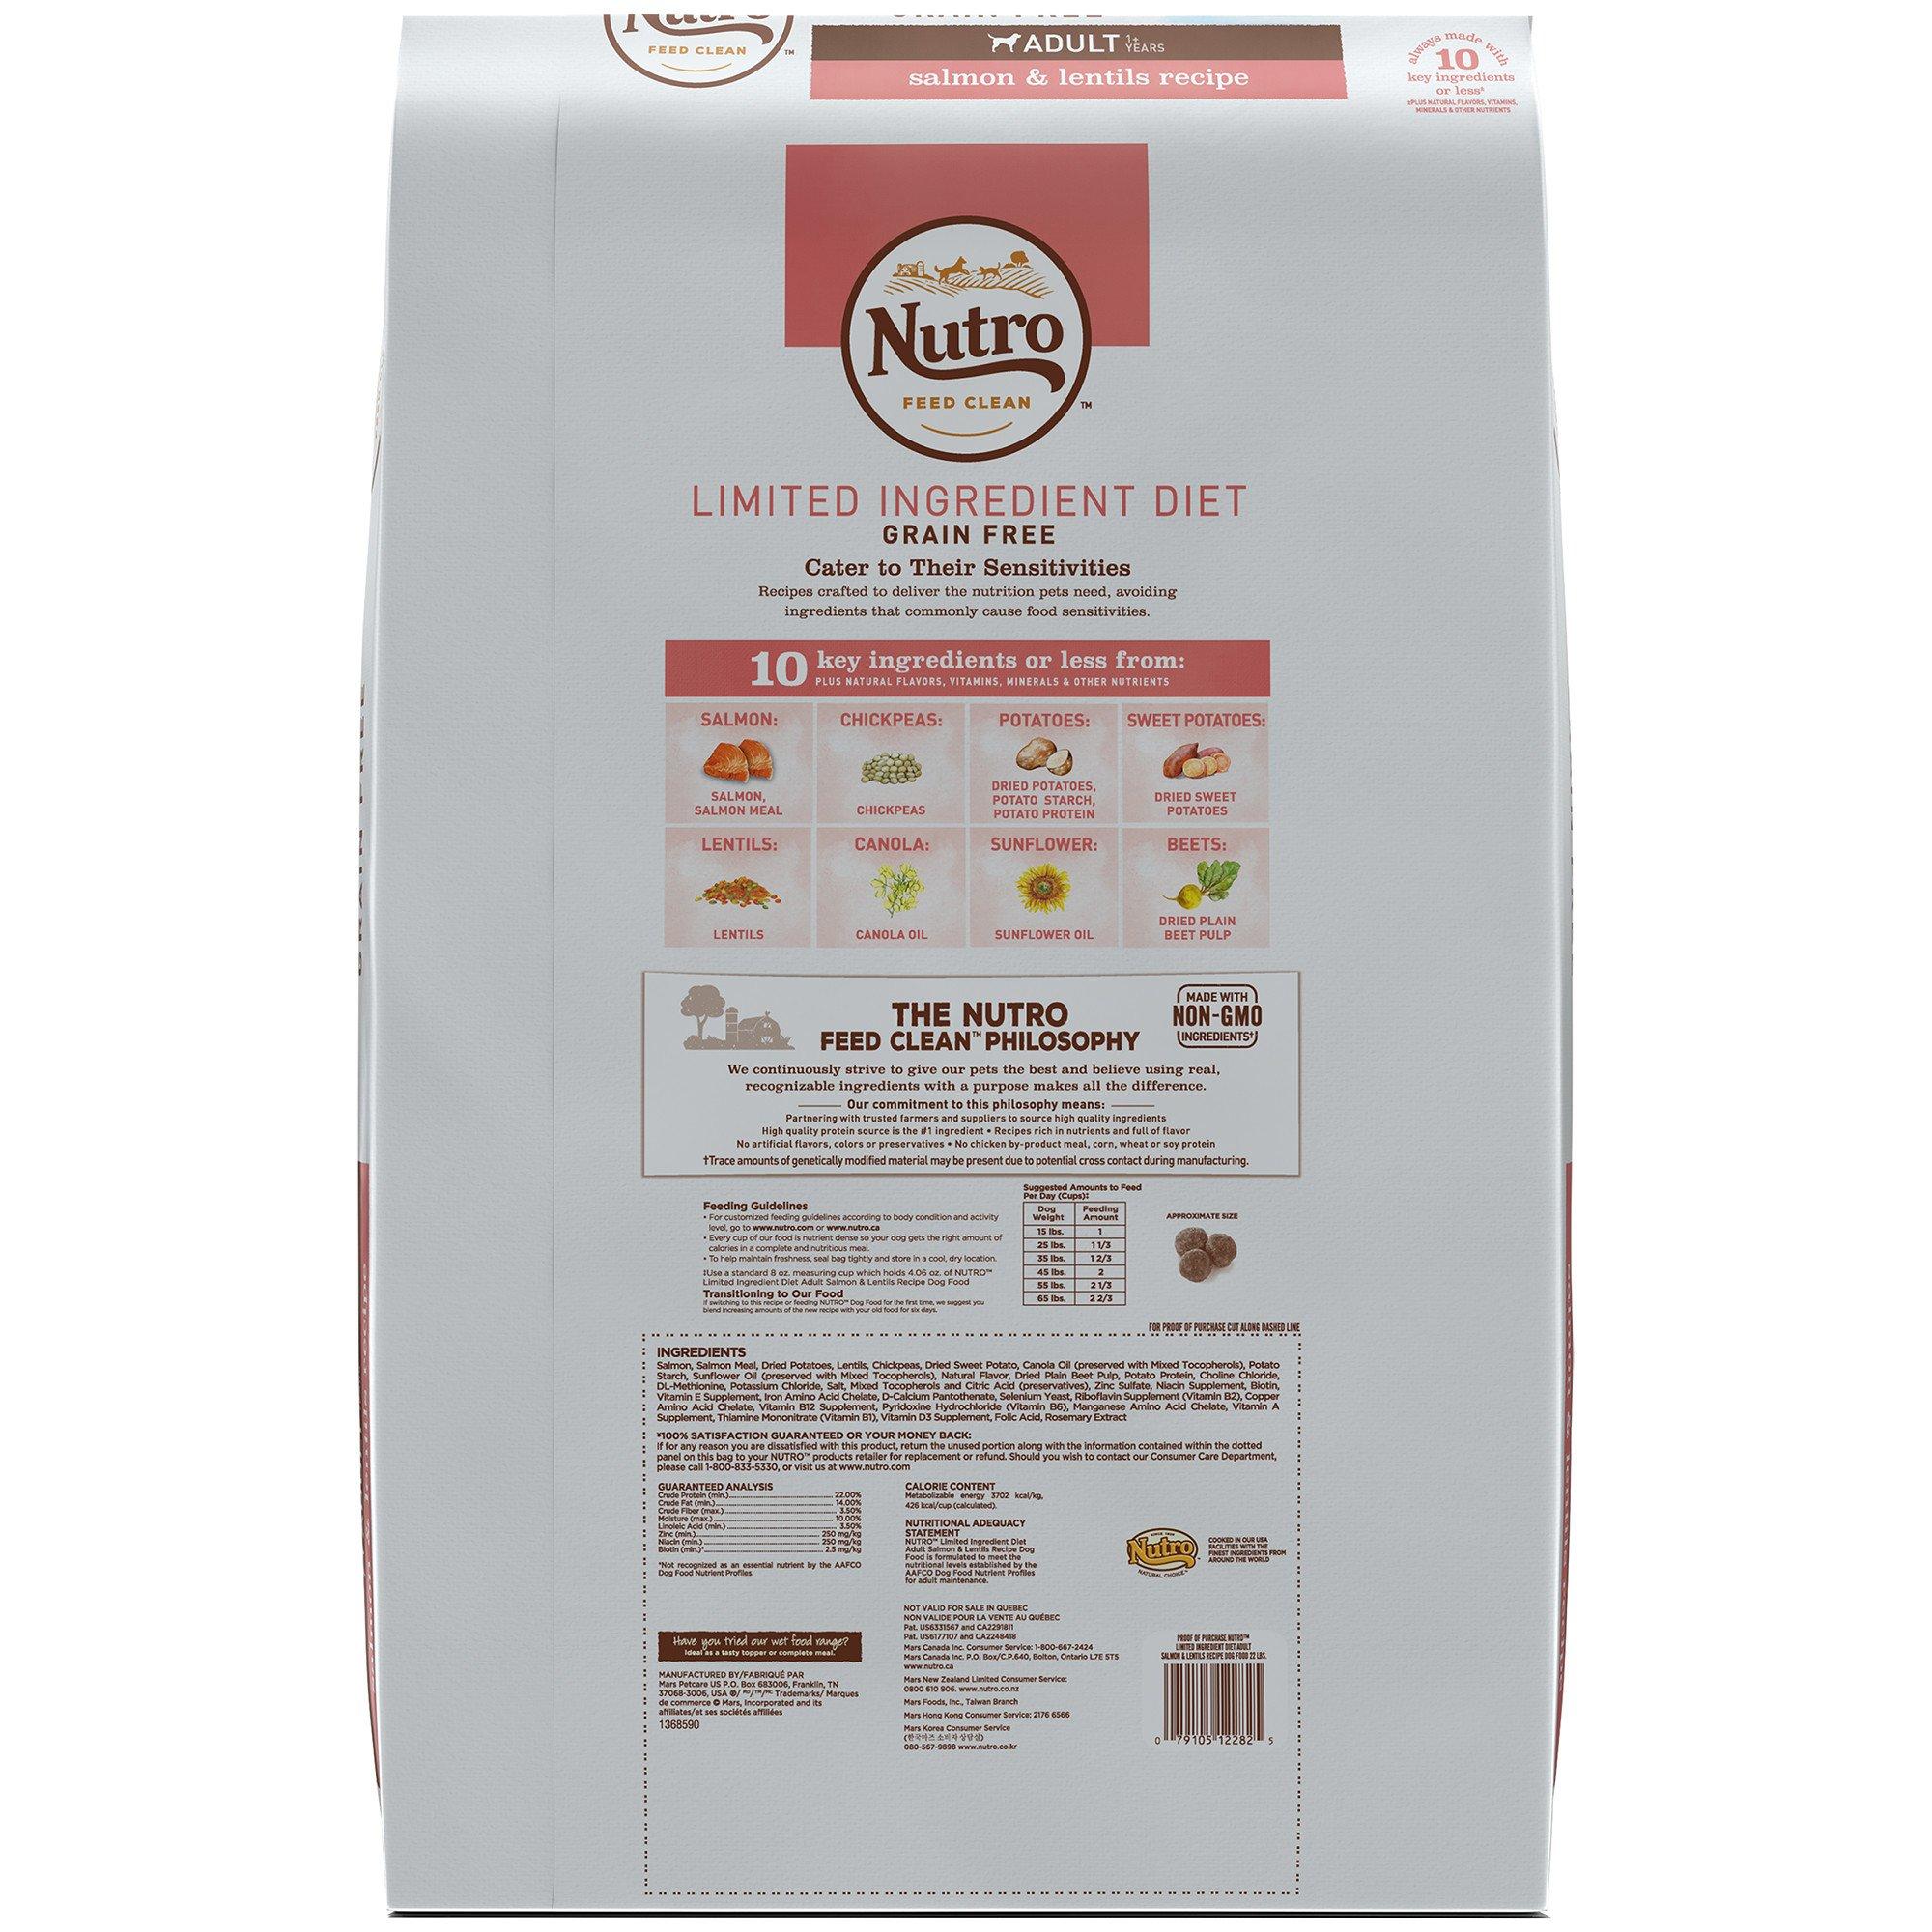 Nutro Limited Ingredient Diet Salmon Lentils Recipe Dry Adult